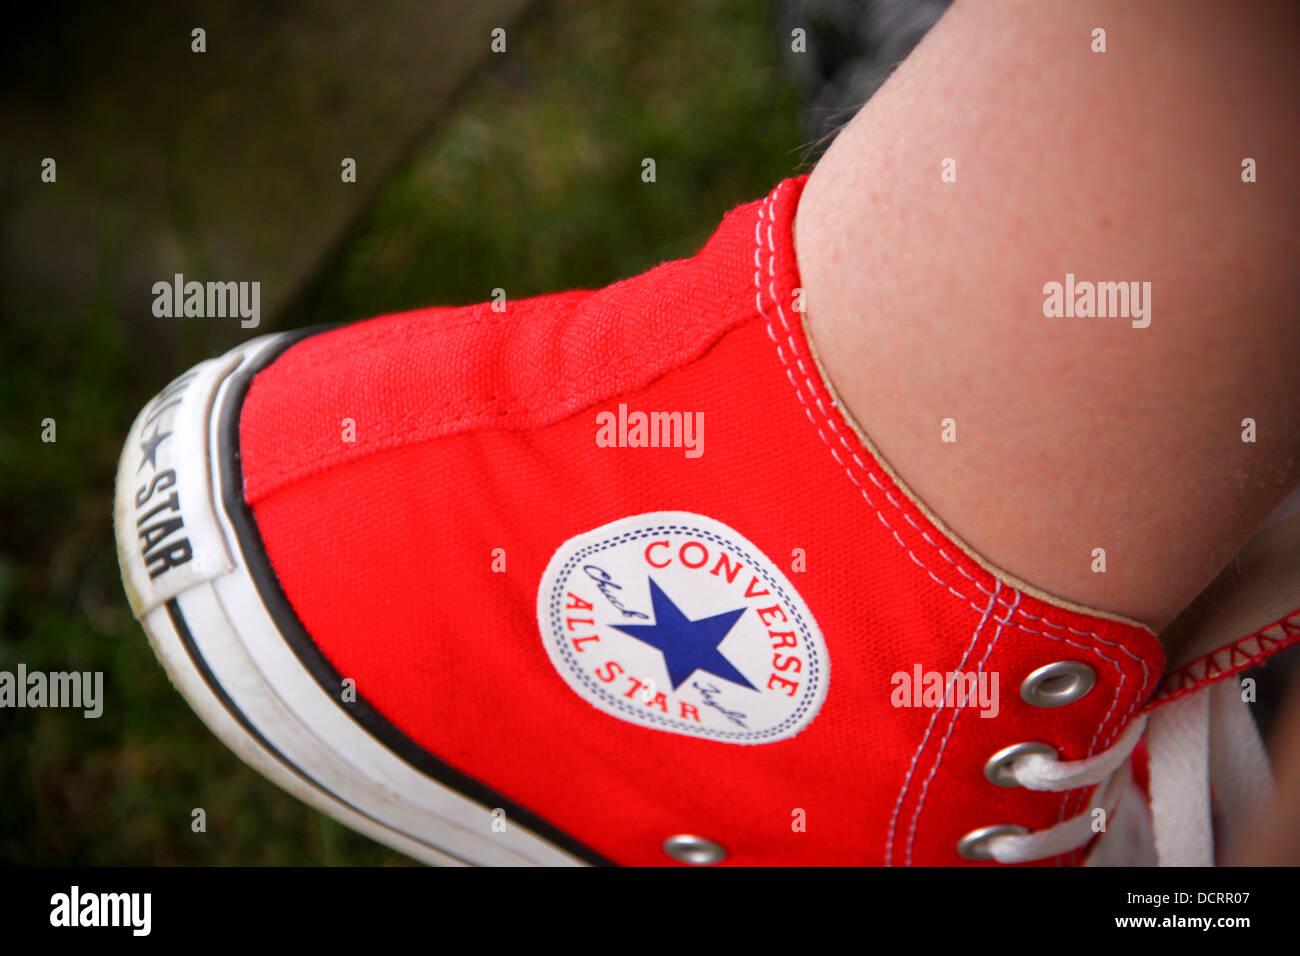 Baseball Boots Stockfotos & Baseball Boots Bilder Alamy